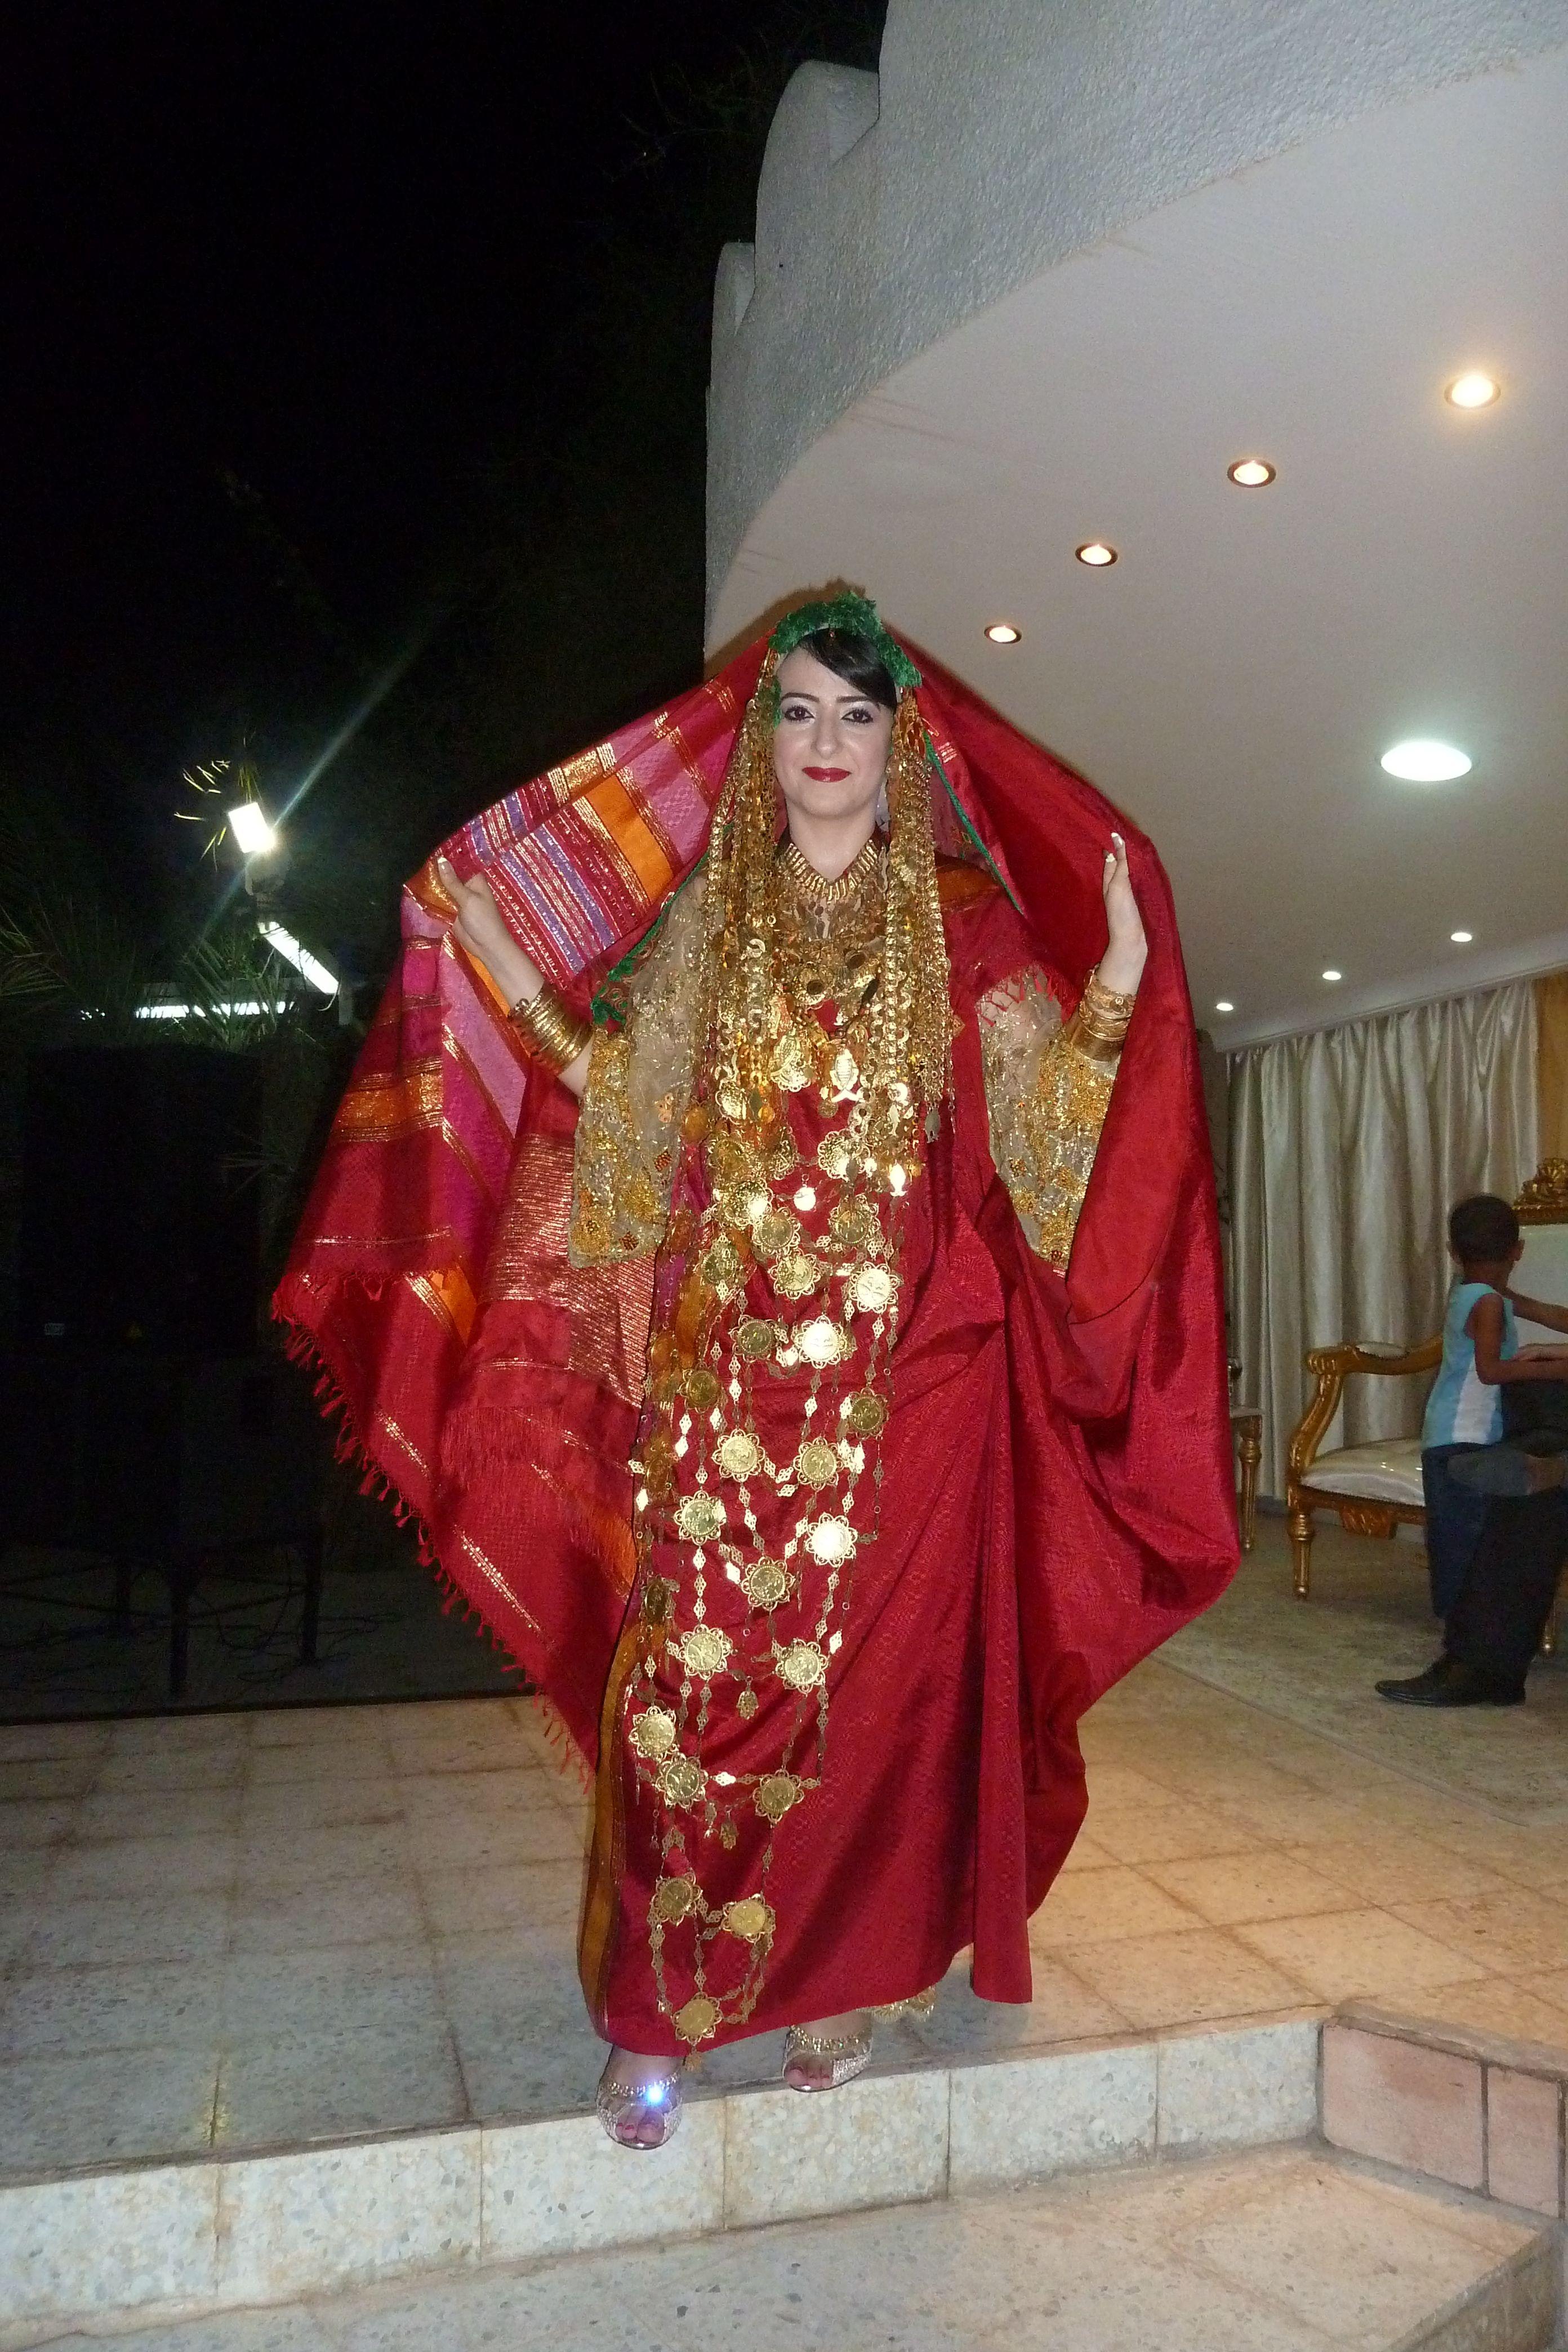 Tunisian wedding - first traditional dress | My wedding | Pinterest